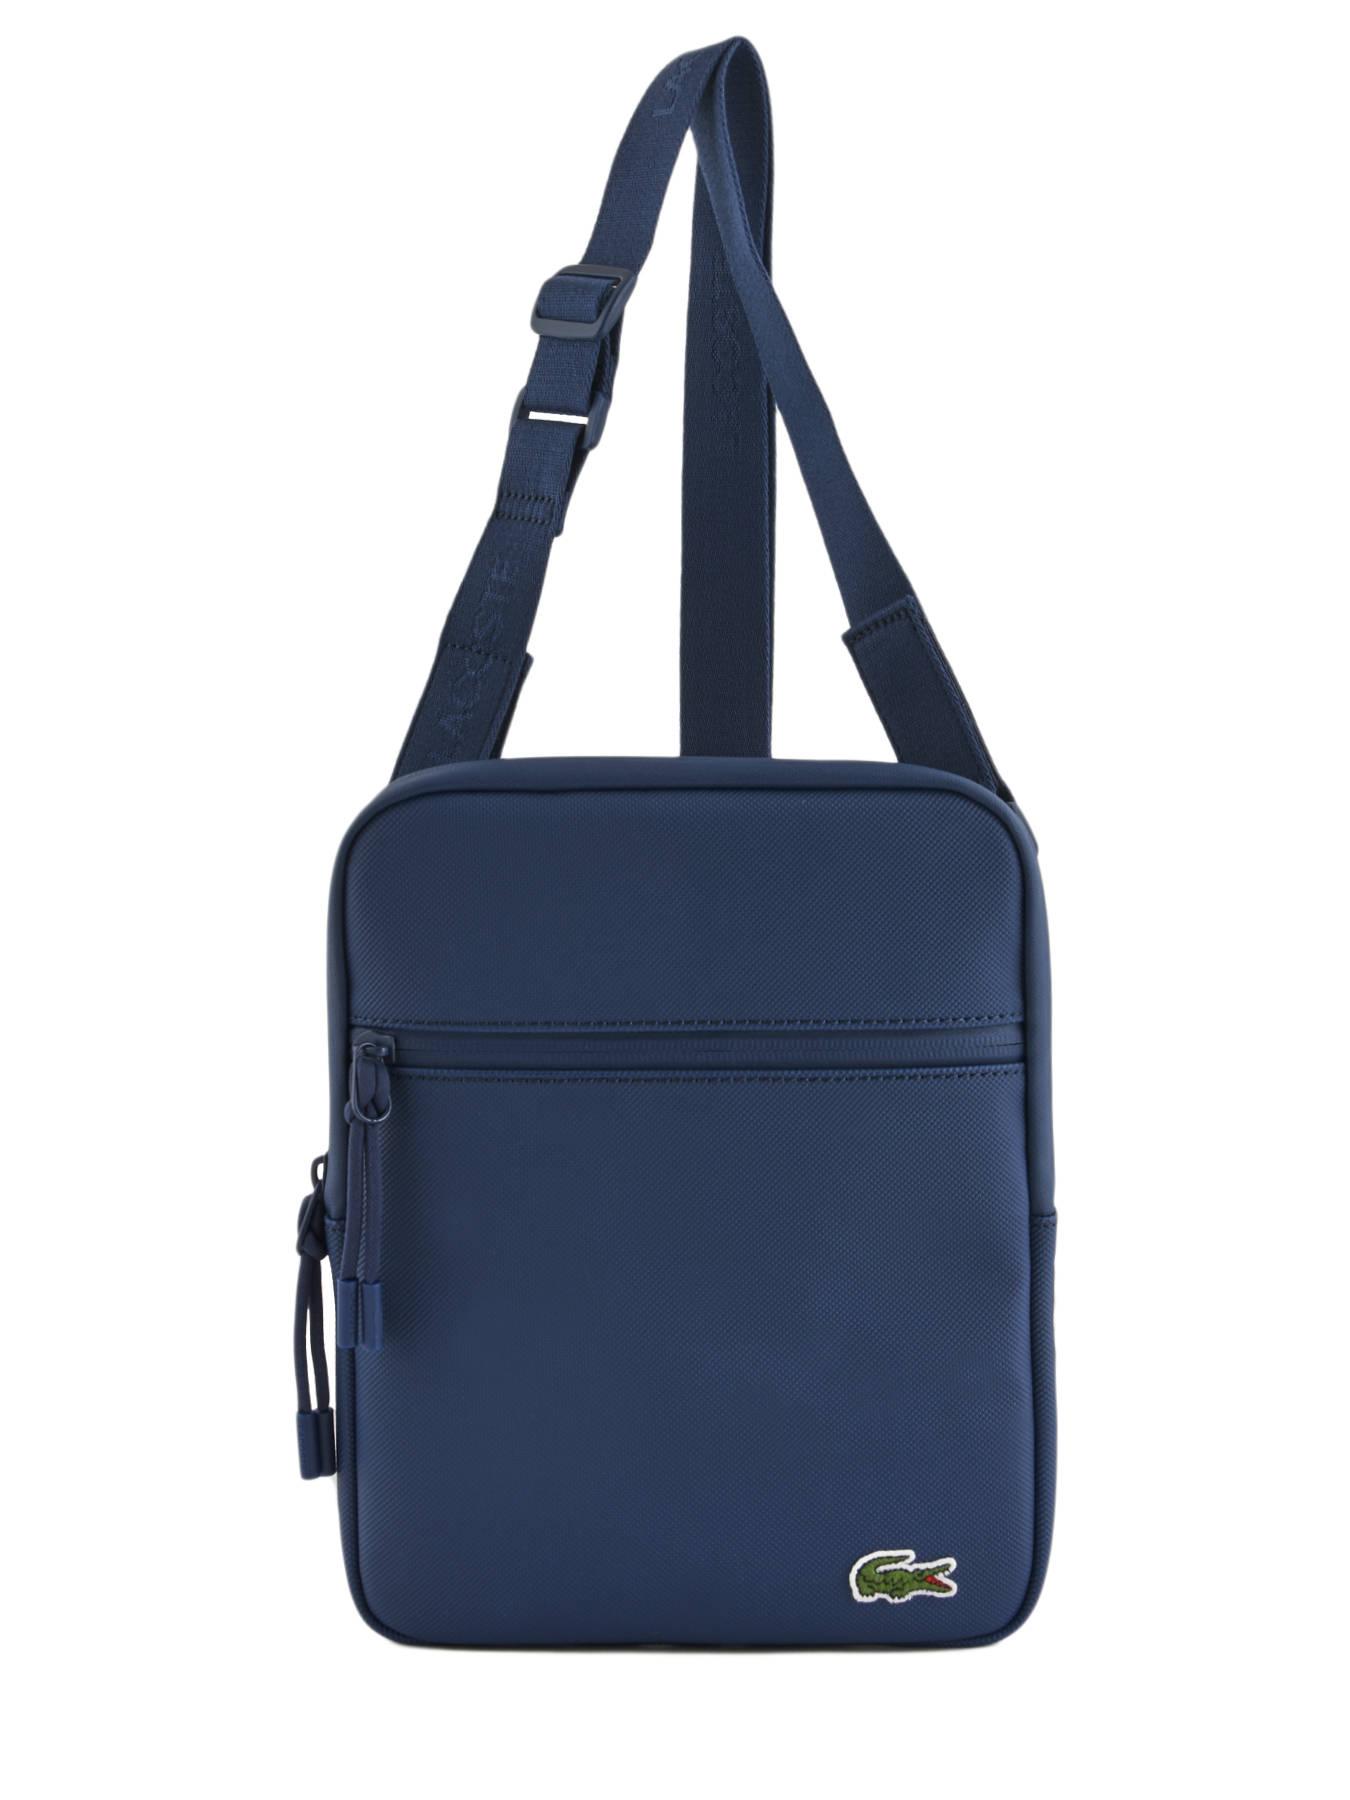 eaeade3d09 ... Crossbody Bag Lacoste Blue l.12.12 concept NH2885PO ...